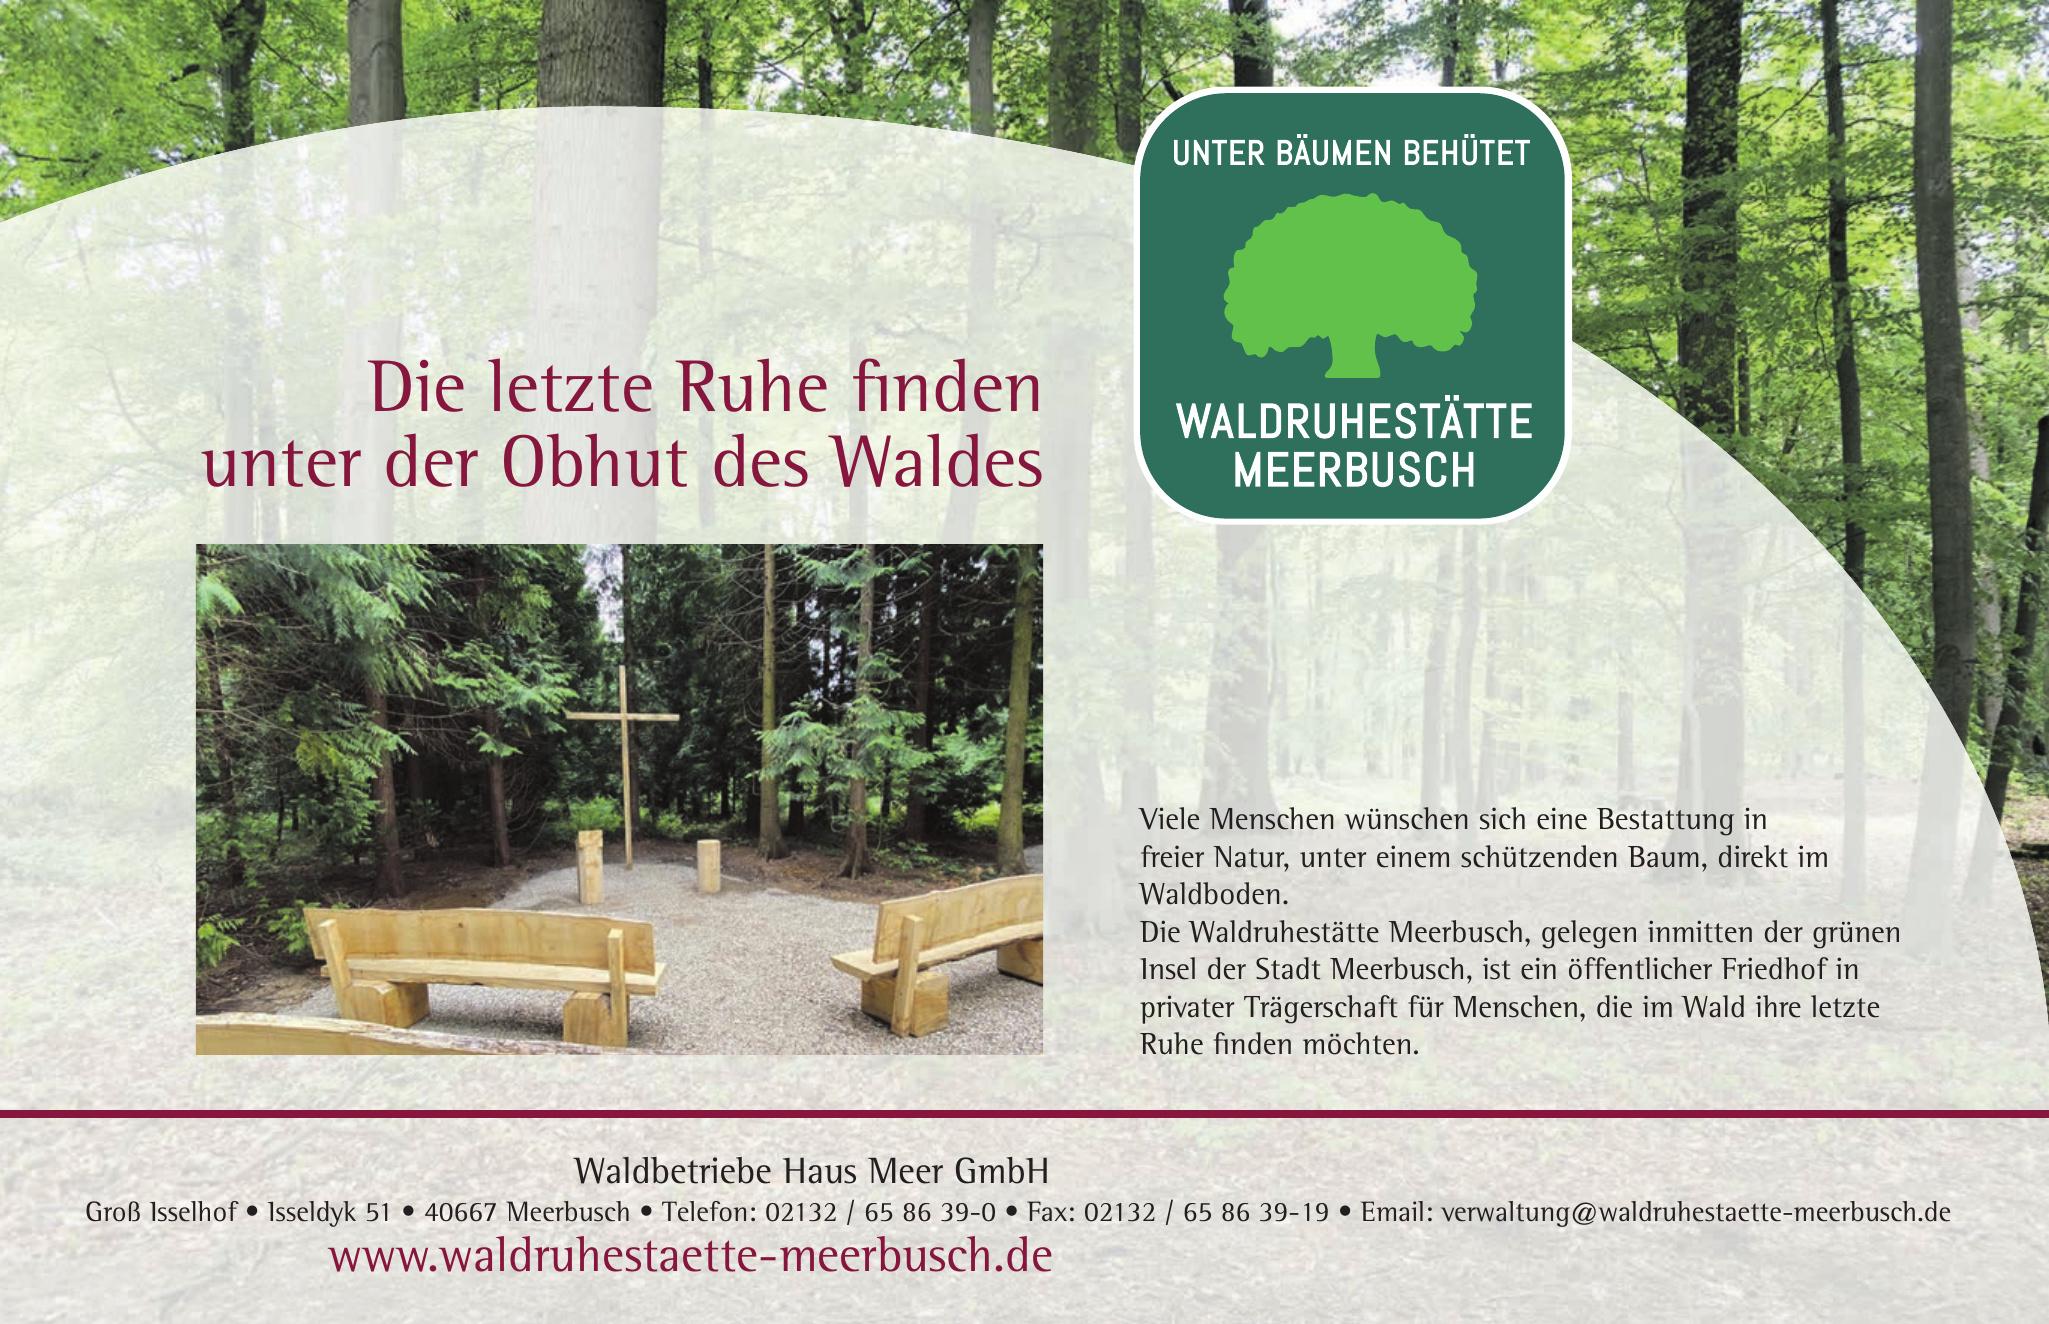 Waldbetriebe Haus Meer GmbH